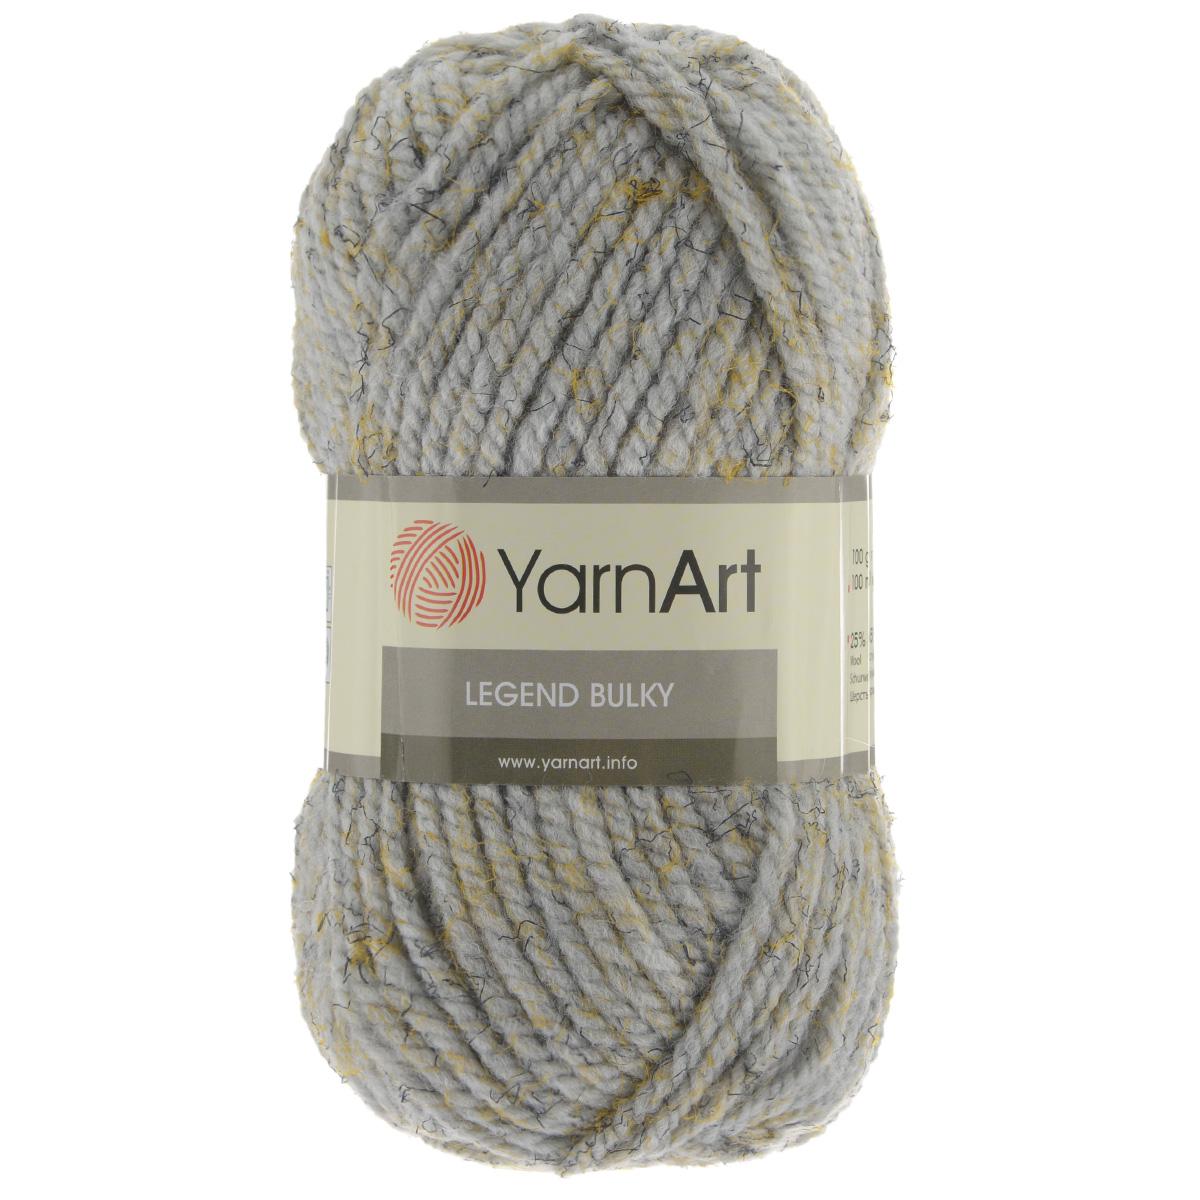 Пряжа для вязания YarnArt Legend Bulky, цвет: сиреневый, желтый, черный (8822), 100 м, 100 г, 5 шт пряжа для вязания yarnart baby color цвет белый черный 273 150 м 50 г 5 шт